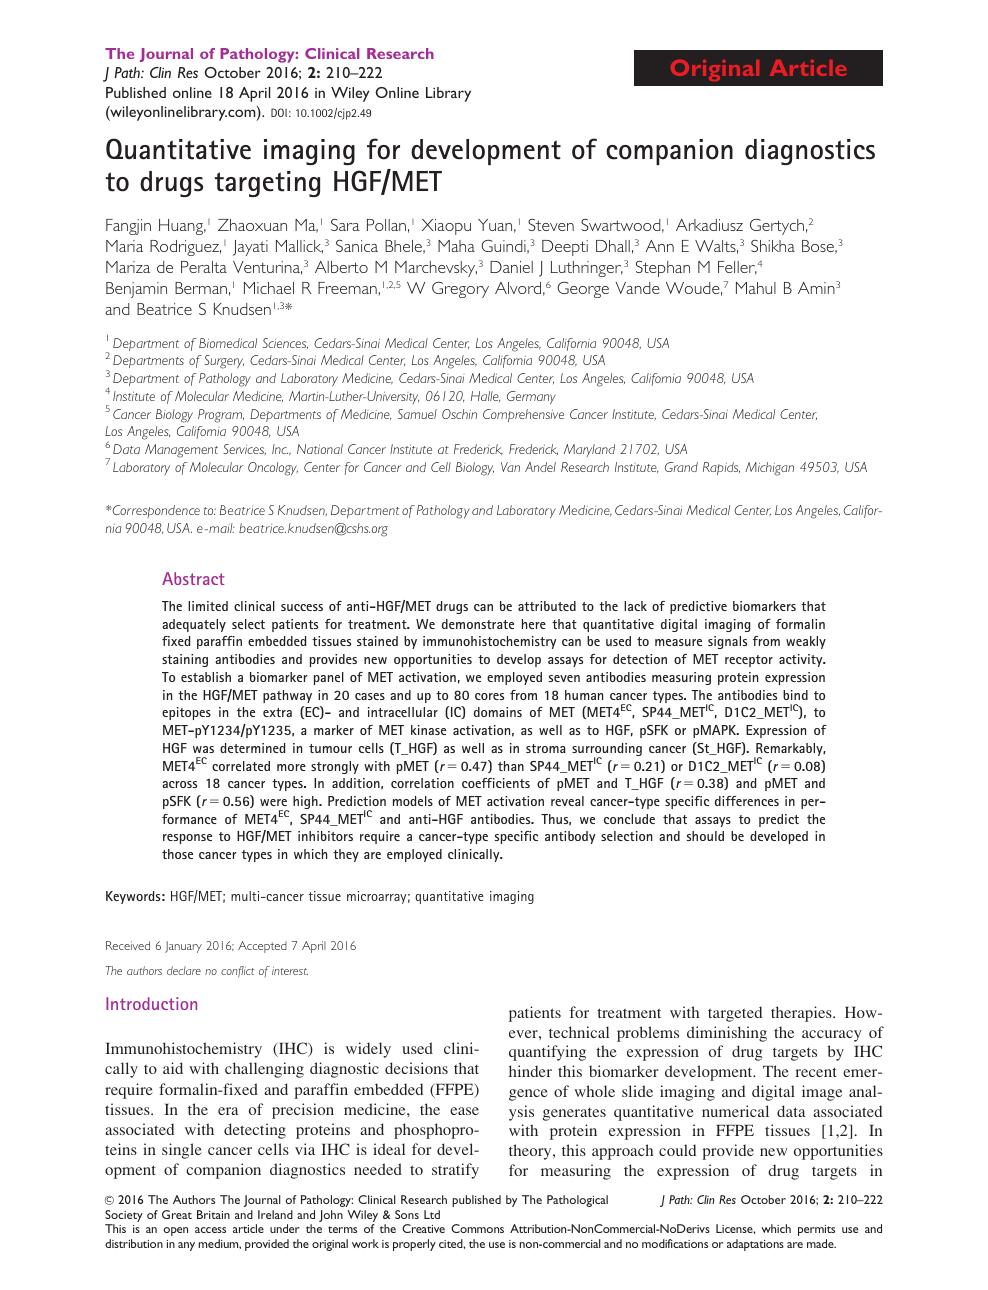 Quantitative imaging for development of companion